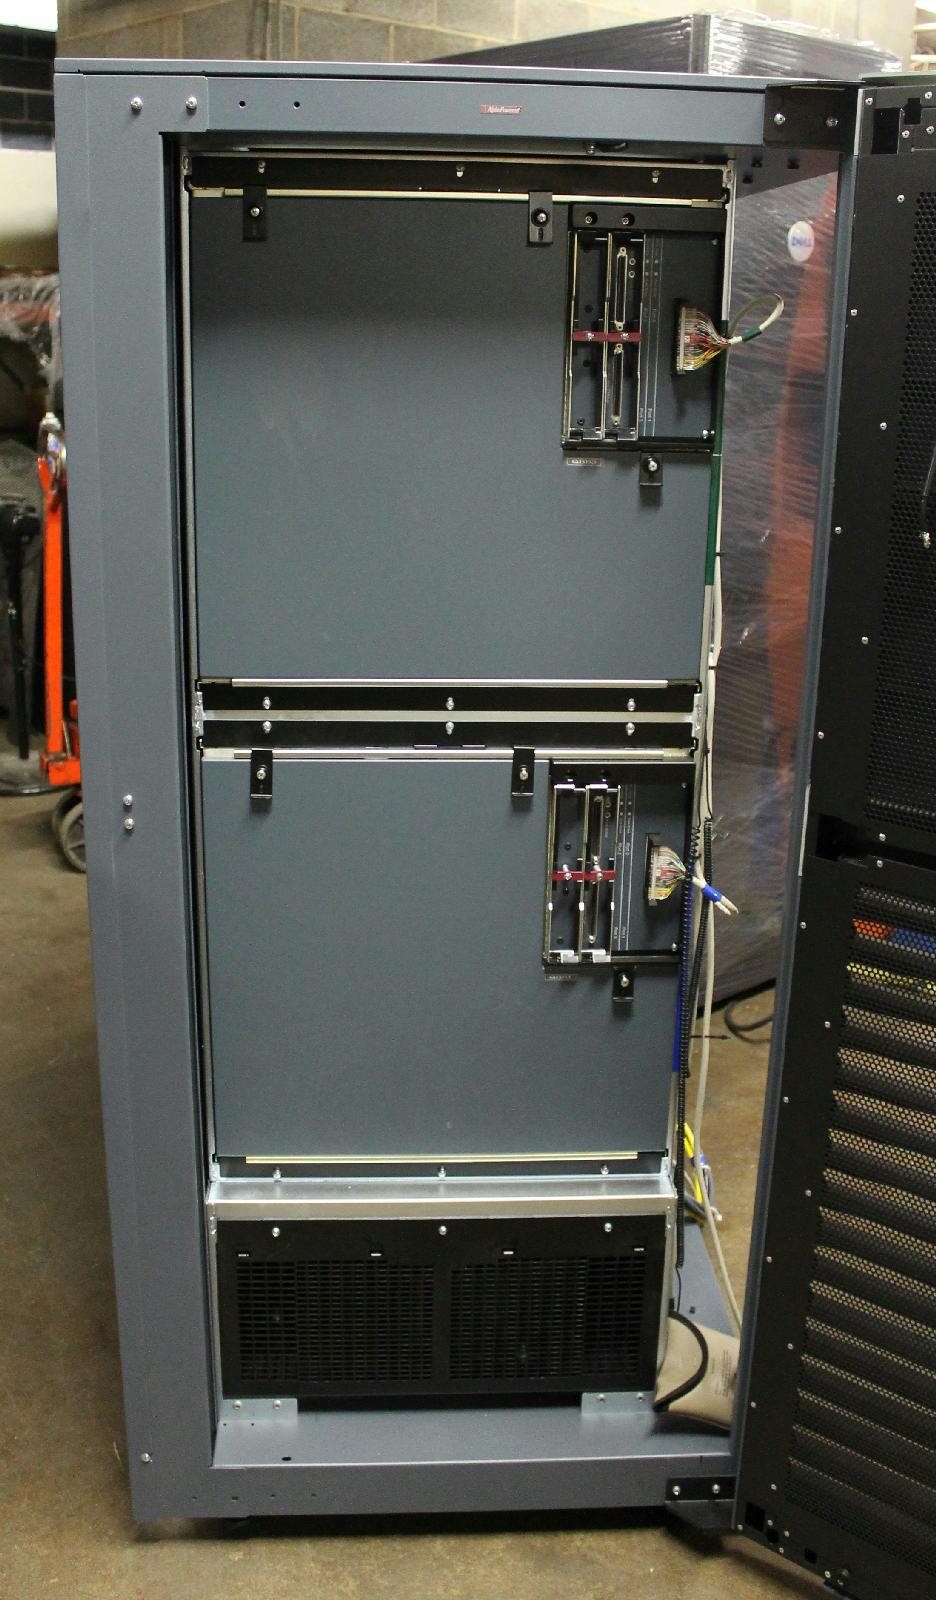 Hp Compaq Alphaserver Gs160 System W Central Processor